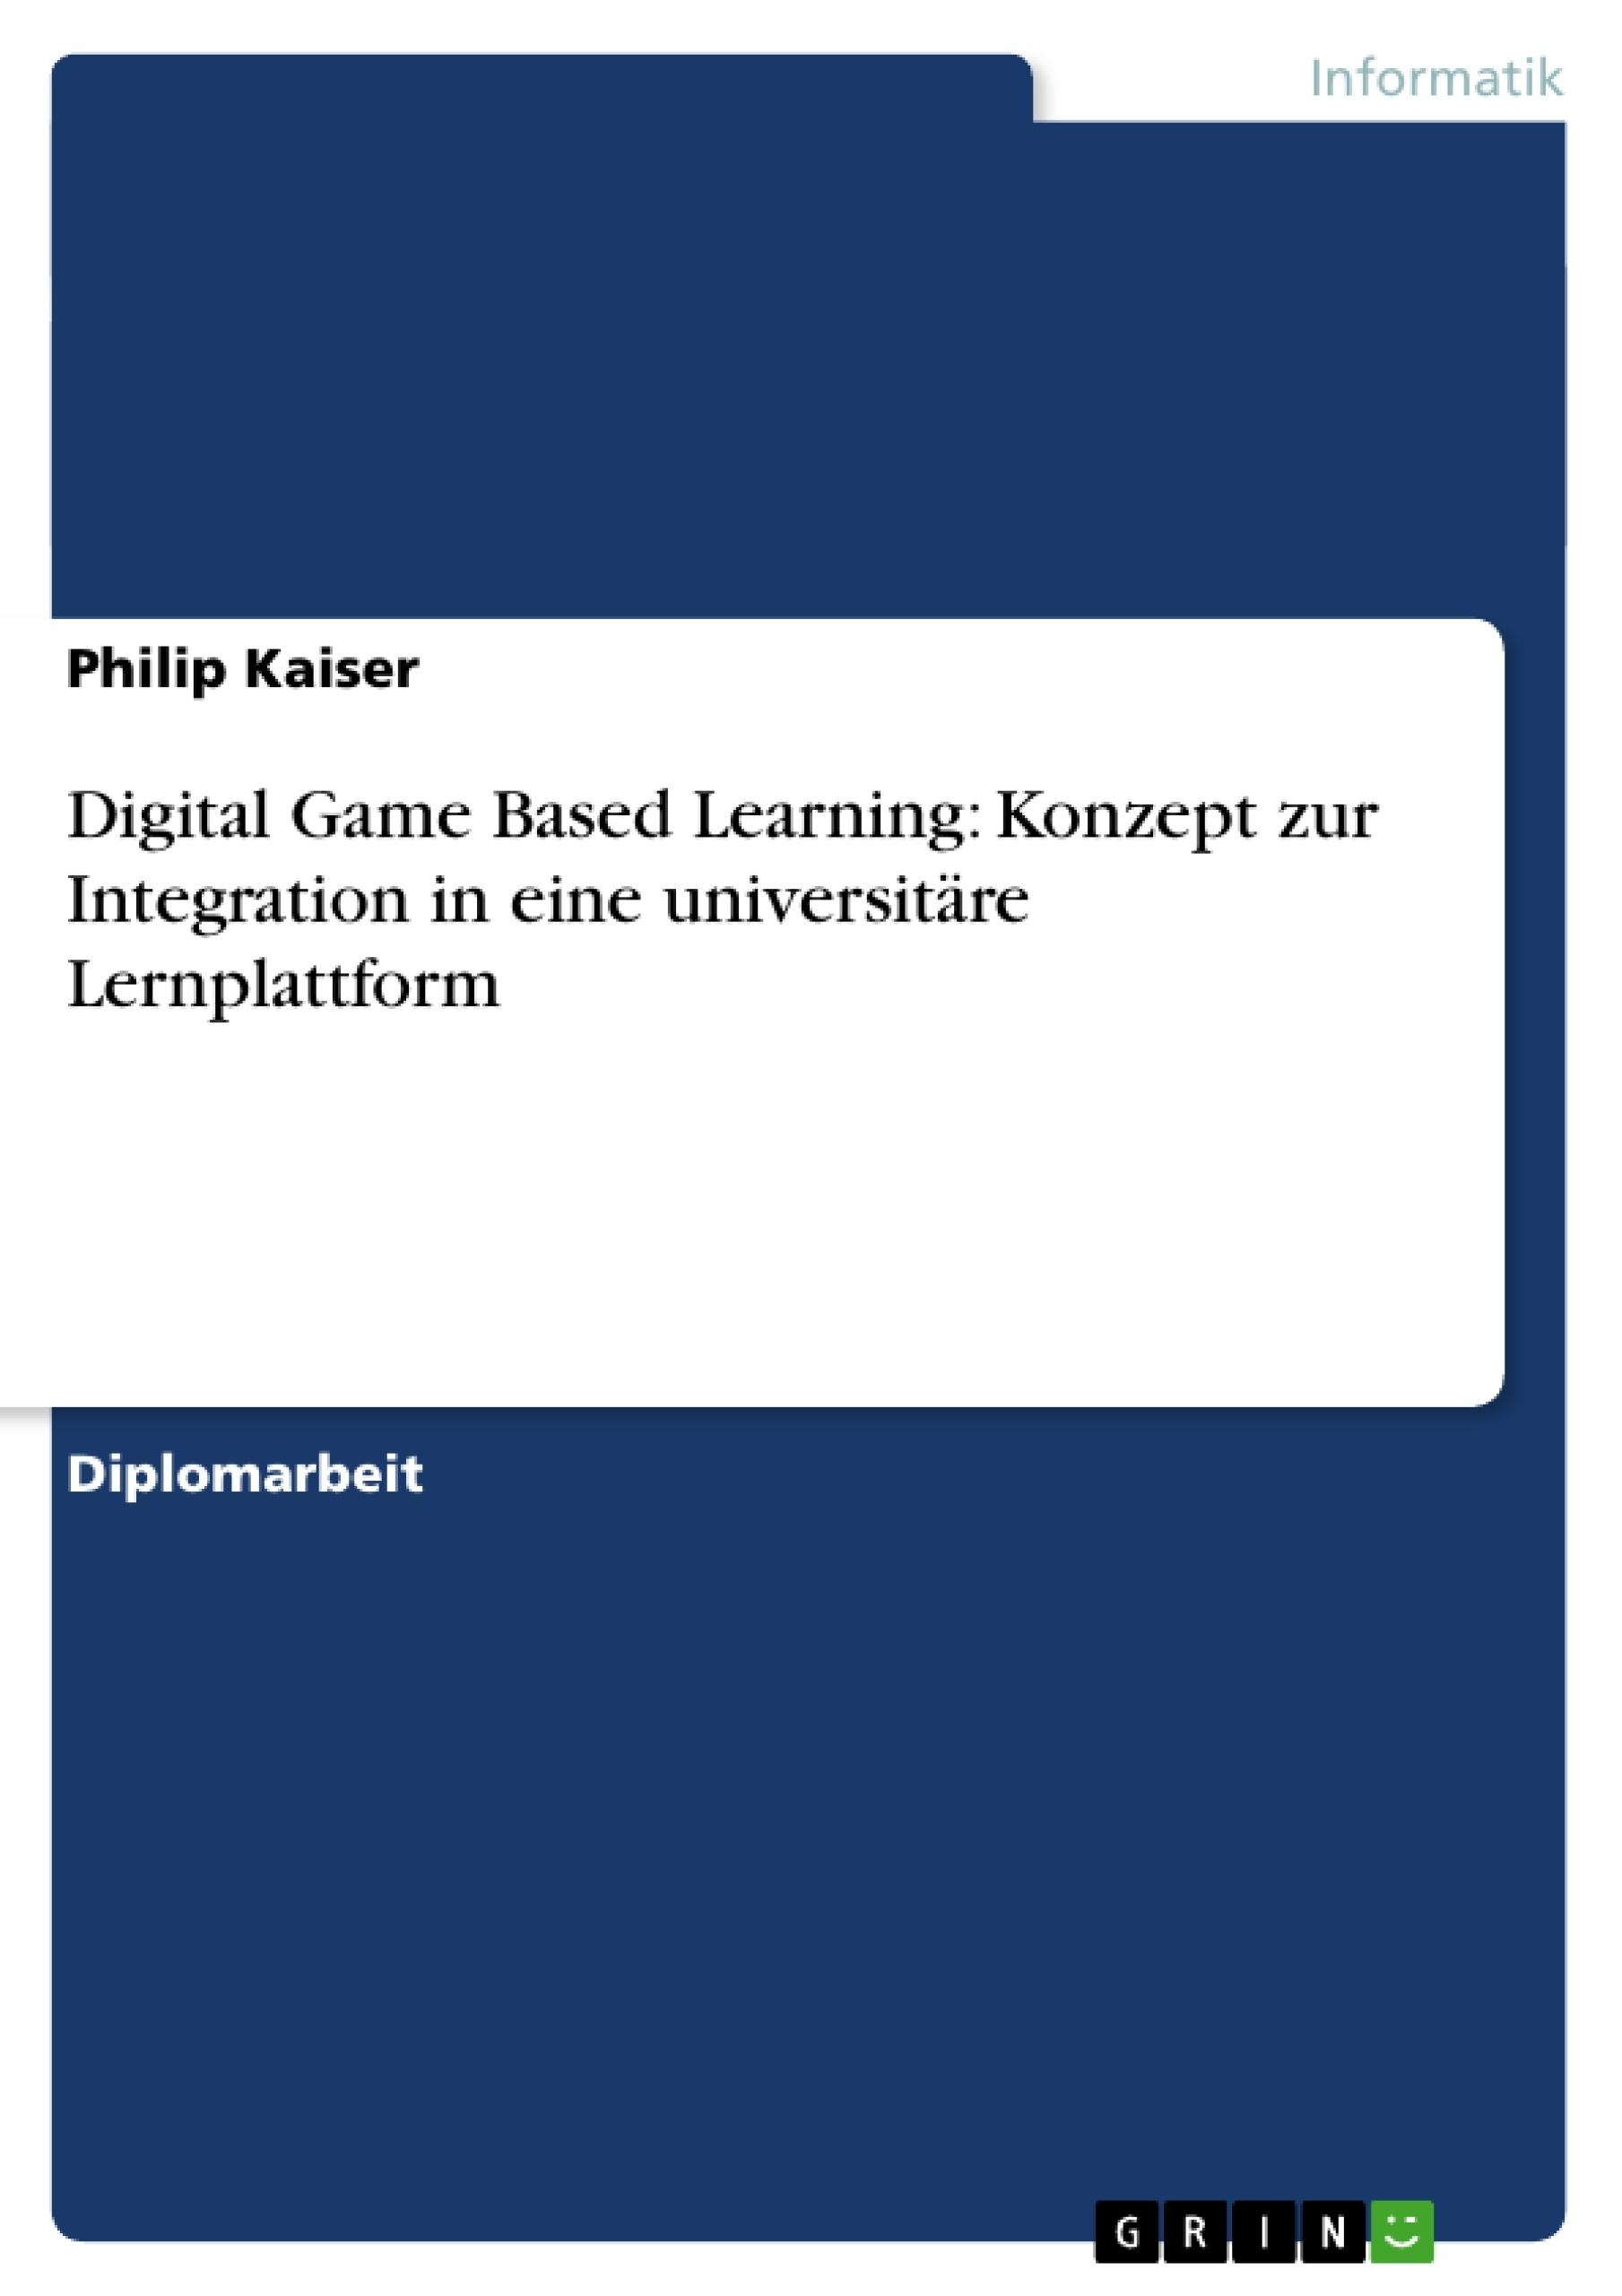 Titel: Digital Game Based Learning: Konzept zur Integration in eine universitäre Lernplattform